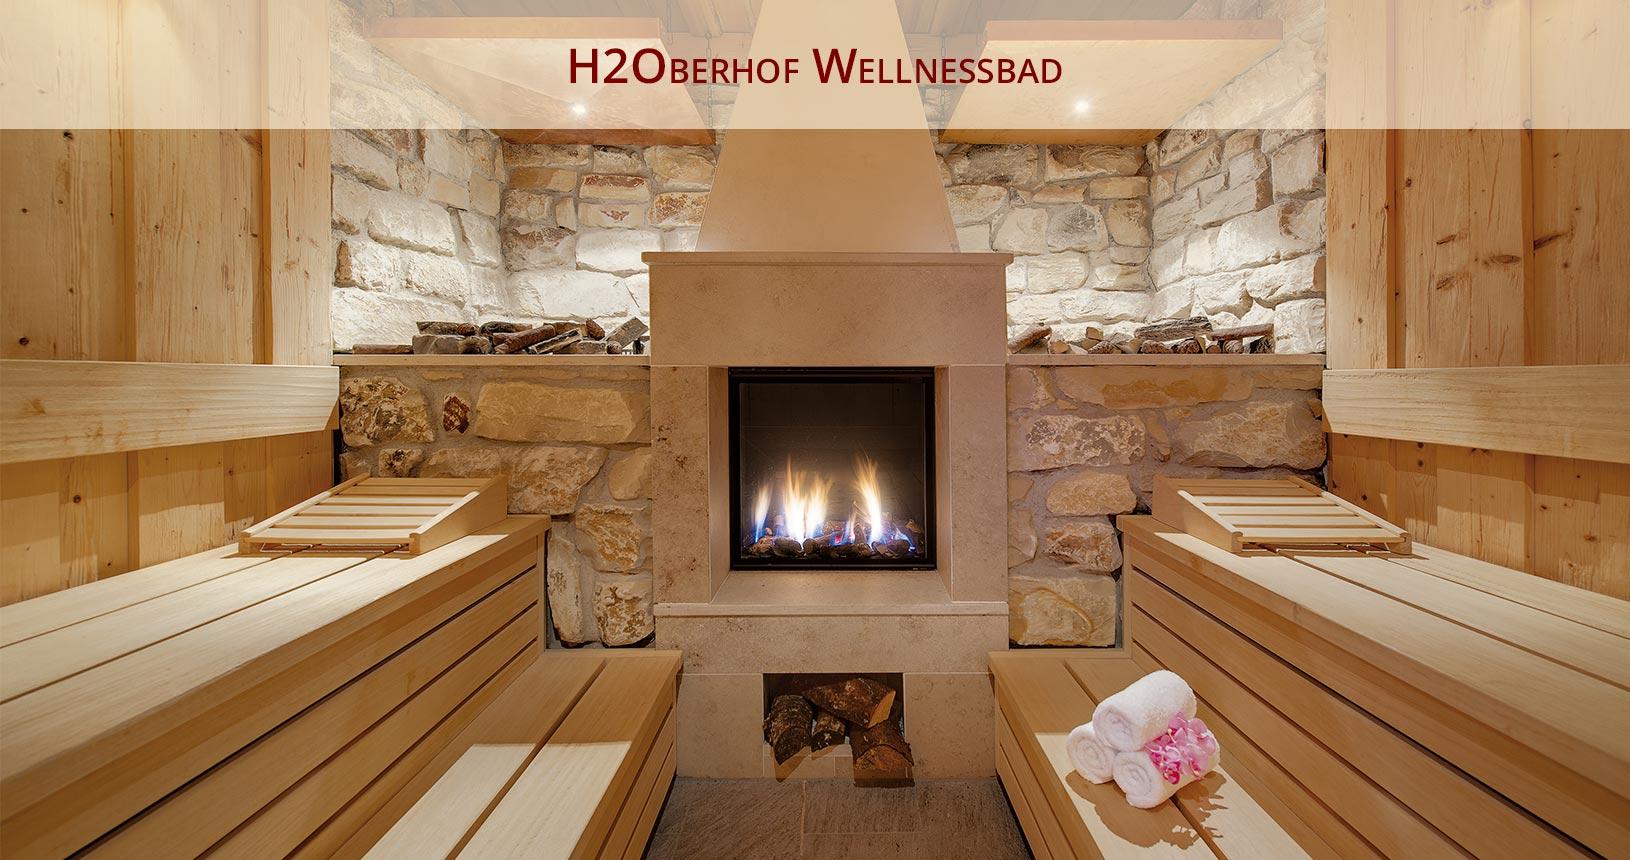 H2Oberhof Wellnessbad Sauna | Oberhof Hotel Urlaub im Thüringenschanze